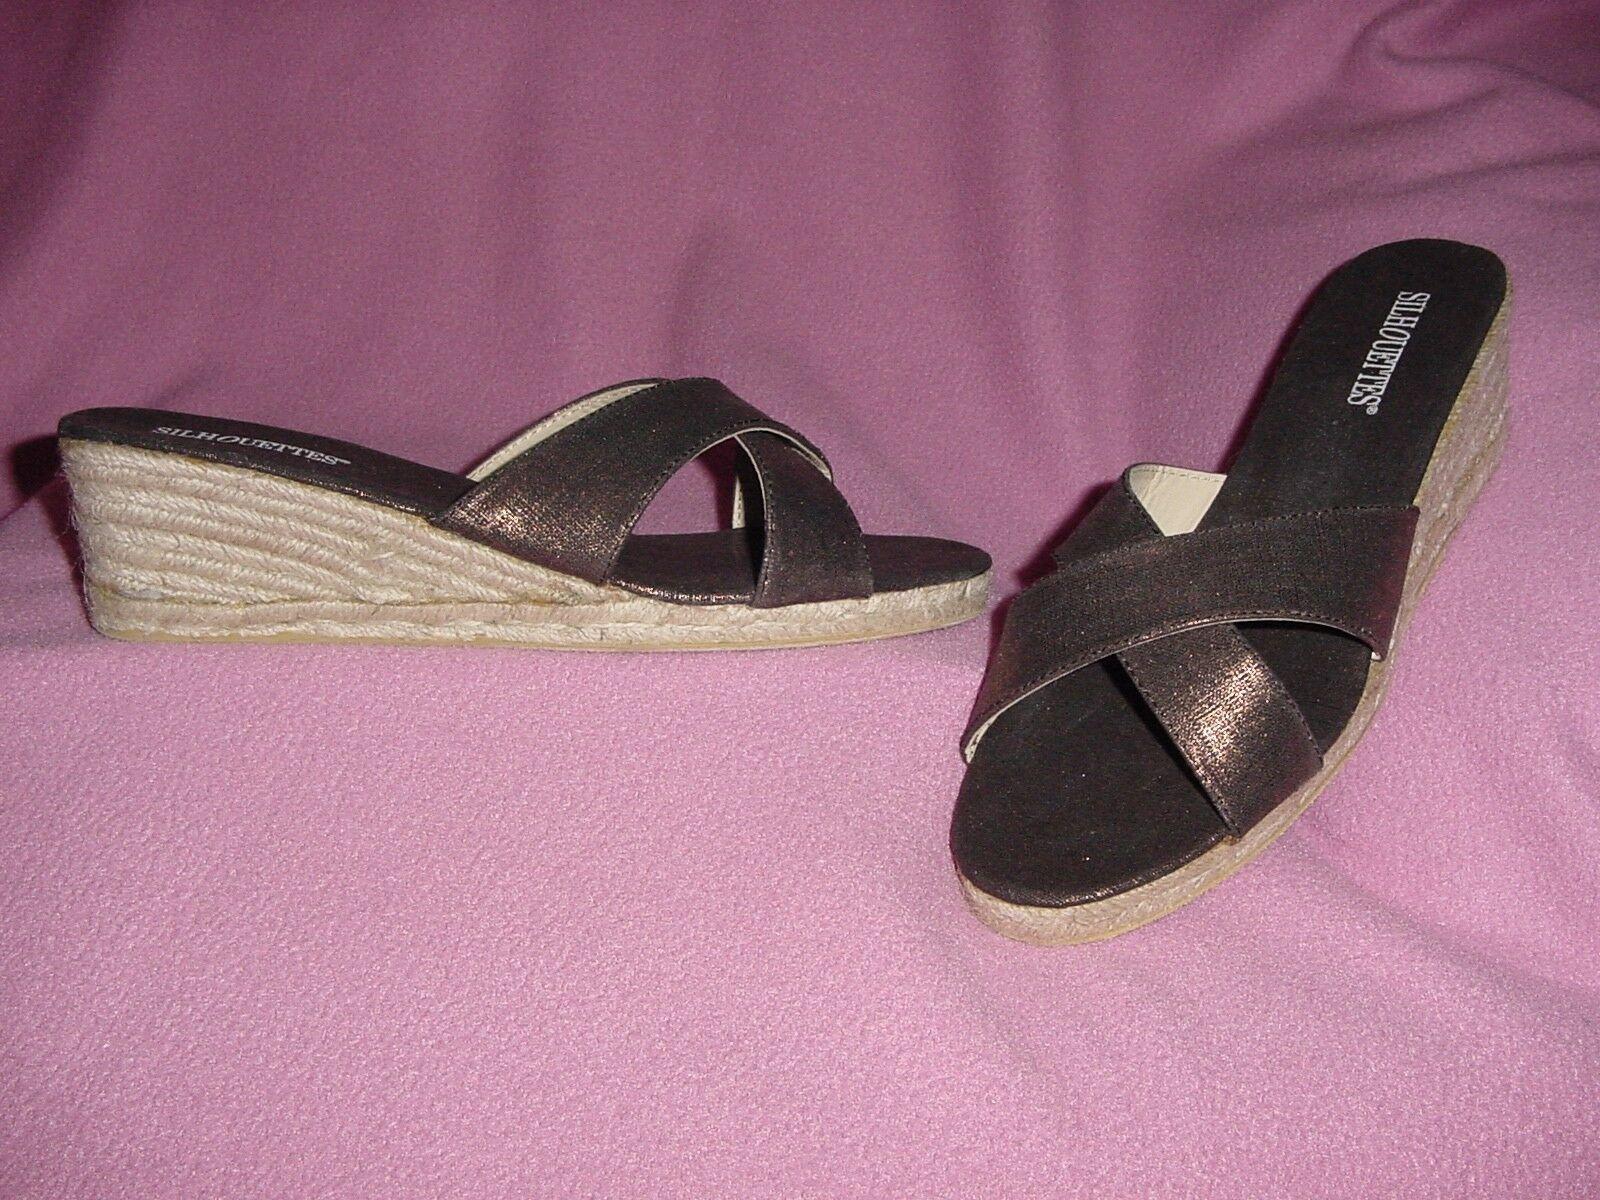 Metallic Bronze Sandal Wedge Slide Sandal Bronze by Silhouettes 11M d7335a